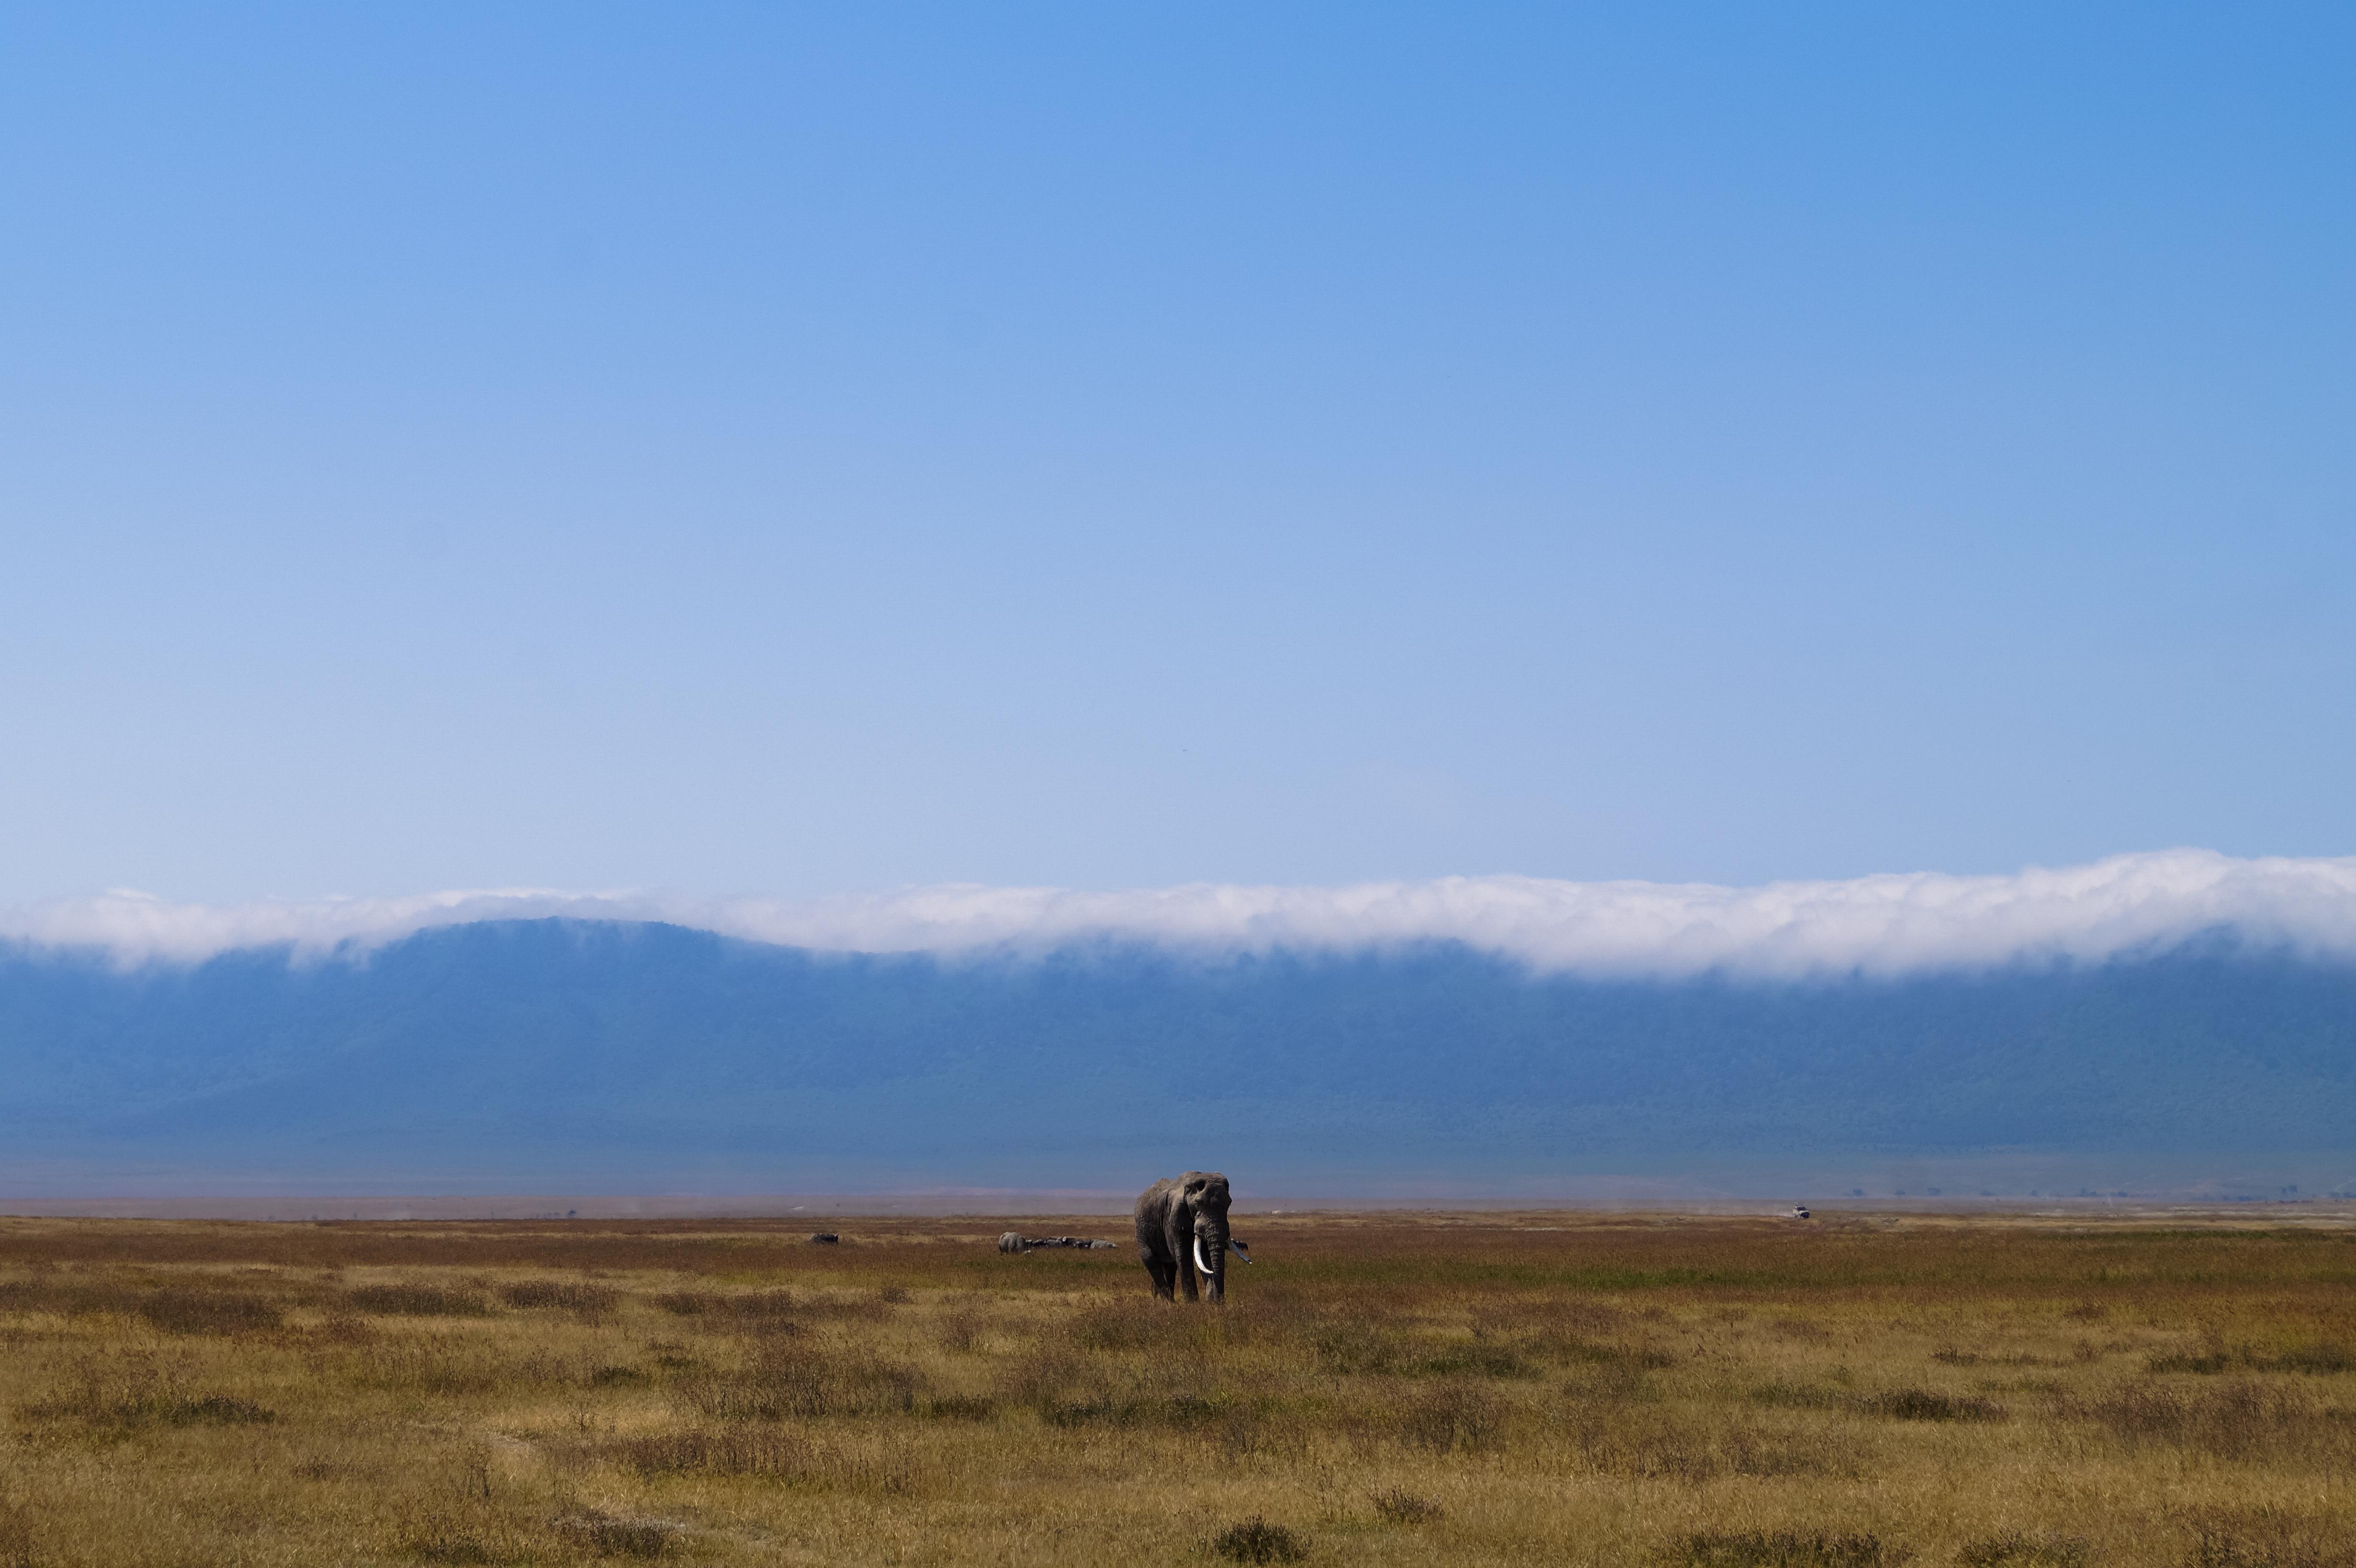 Ngorongoro Conservation Area, Tanzania